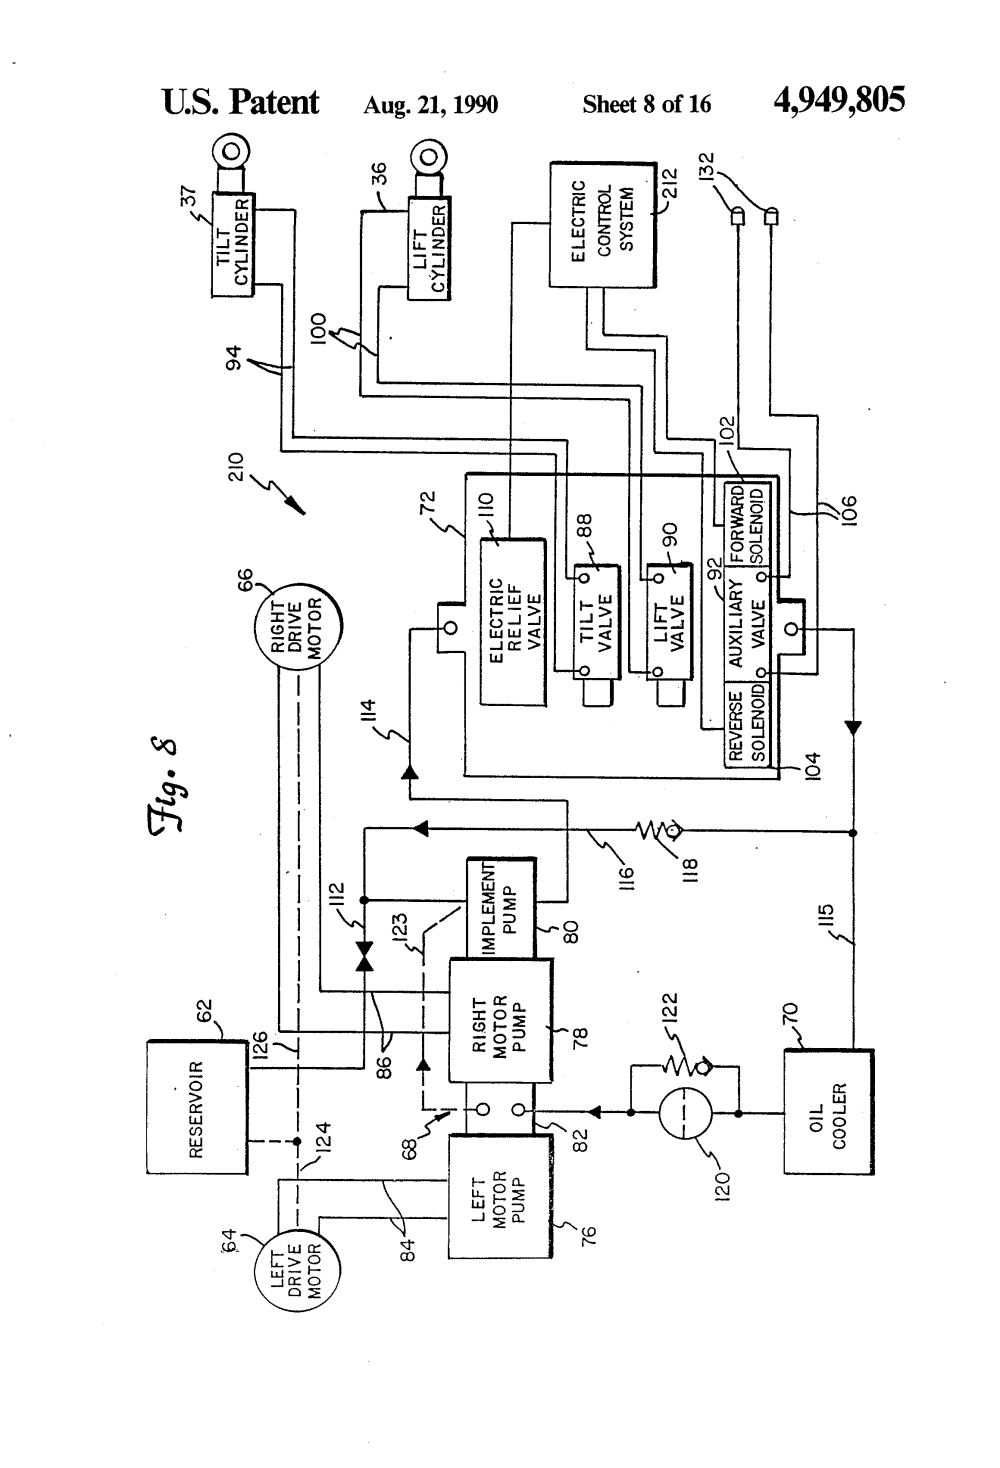 medium resolution of bobcat hydraulic schematic wiring diagram bobcat 773 hydraulic schematic bobcat hydraulic schematic